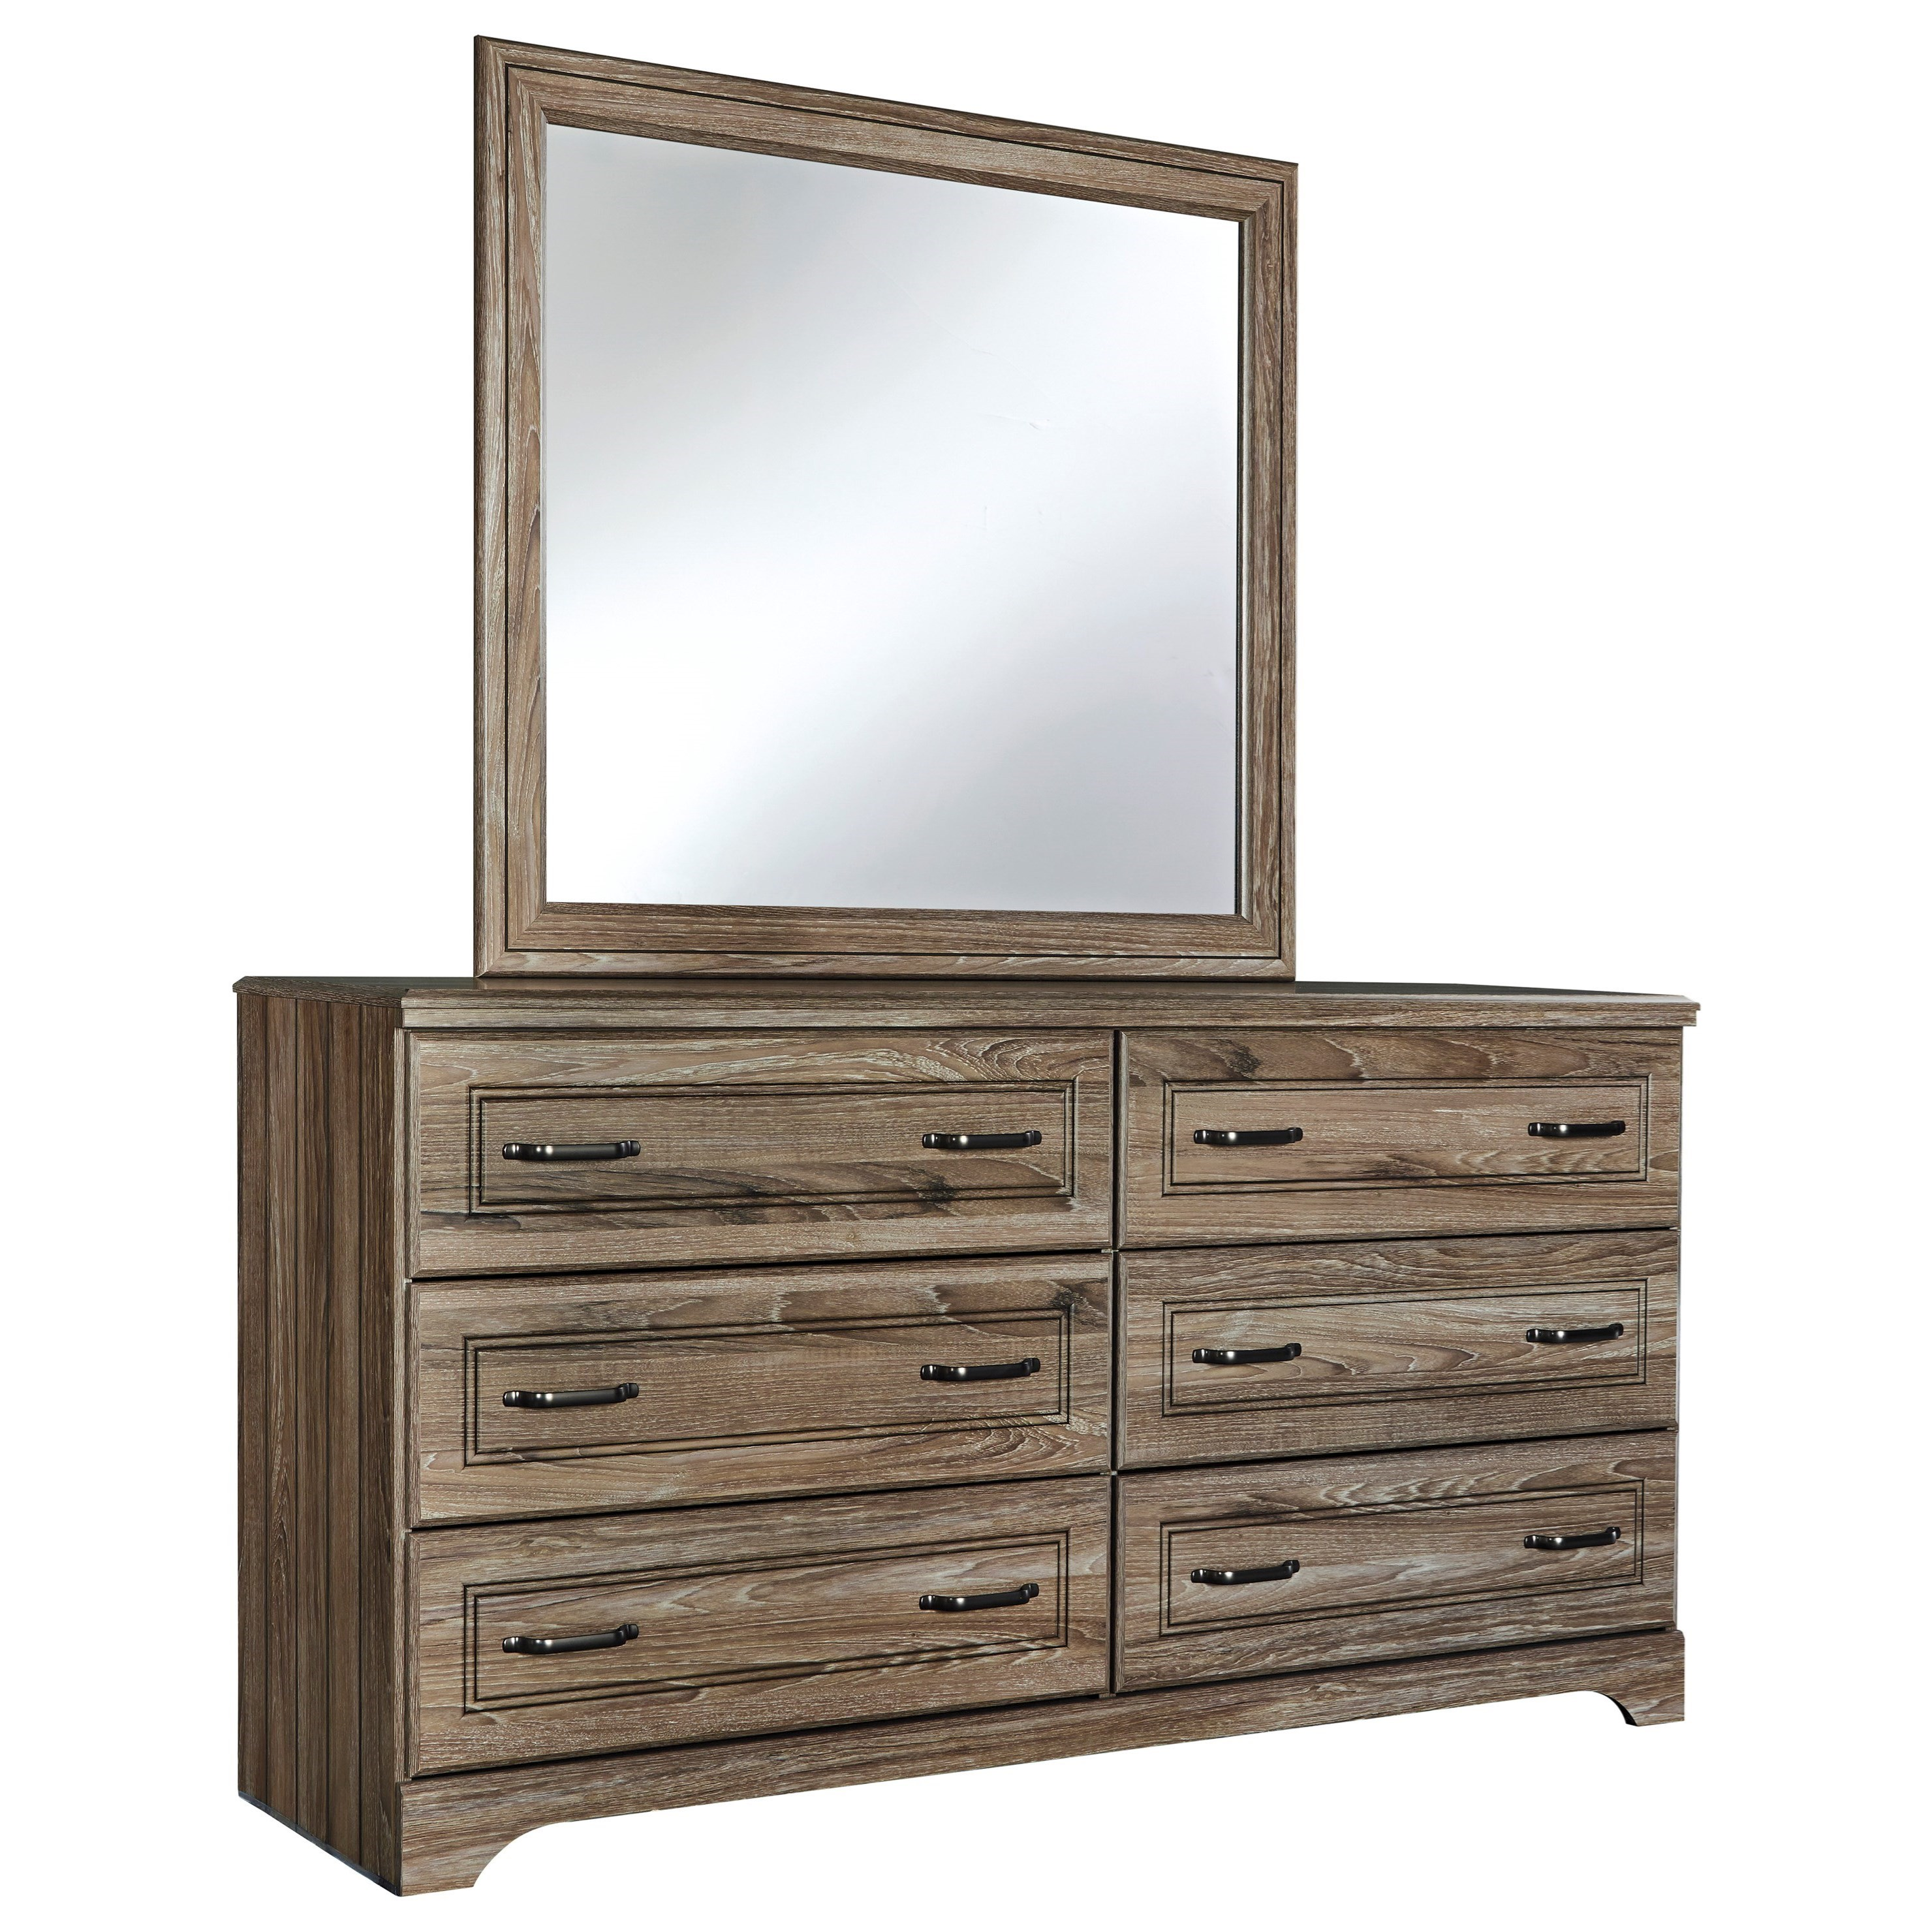 Signature Design By Ashley Javarin Dresser Bedroom Mirror Household Furniture Dresser